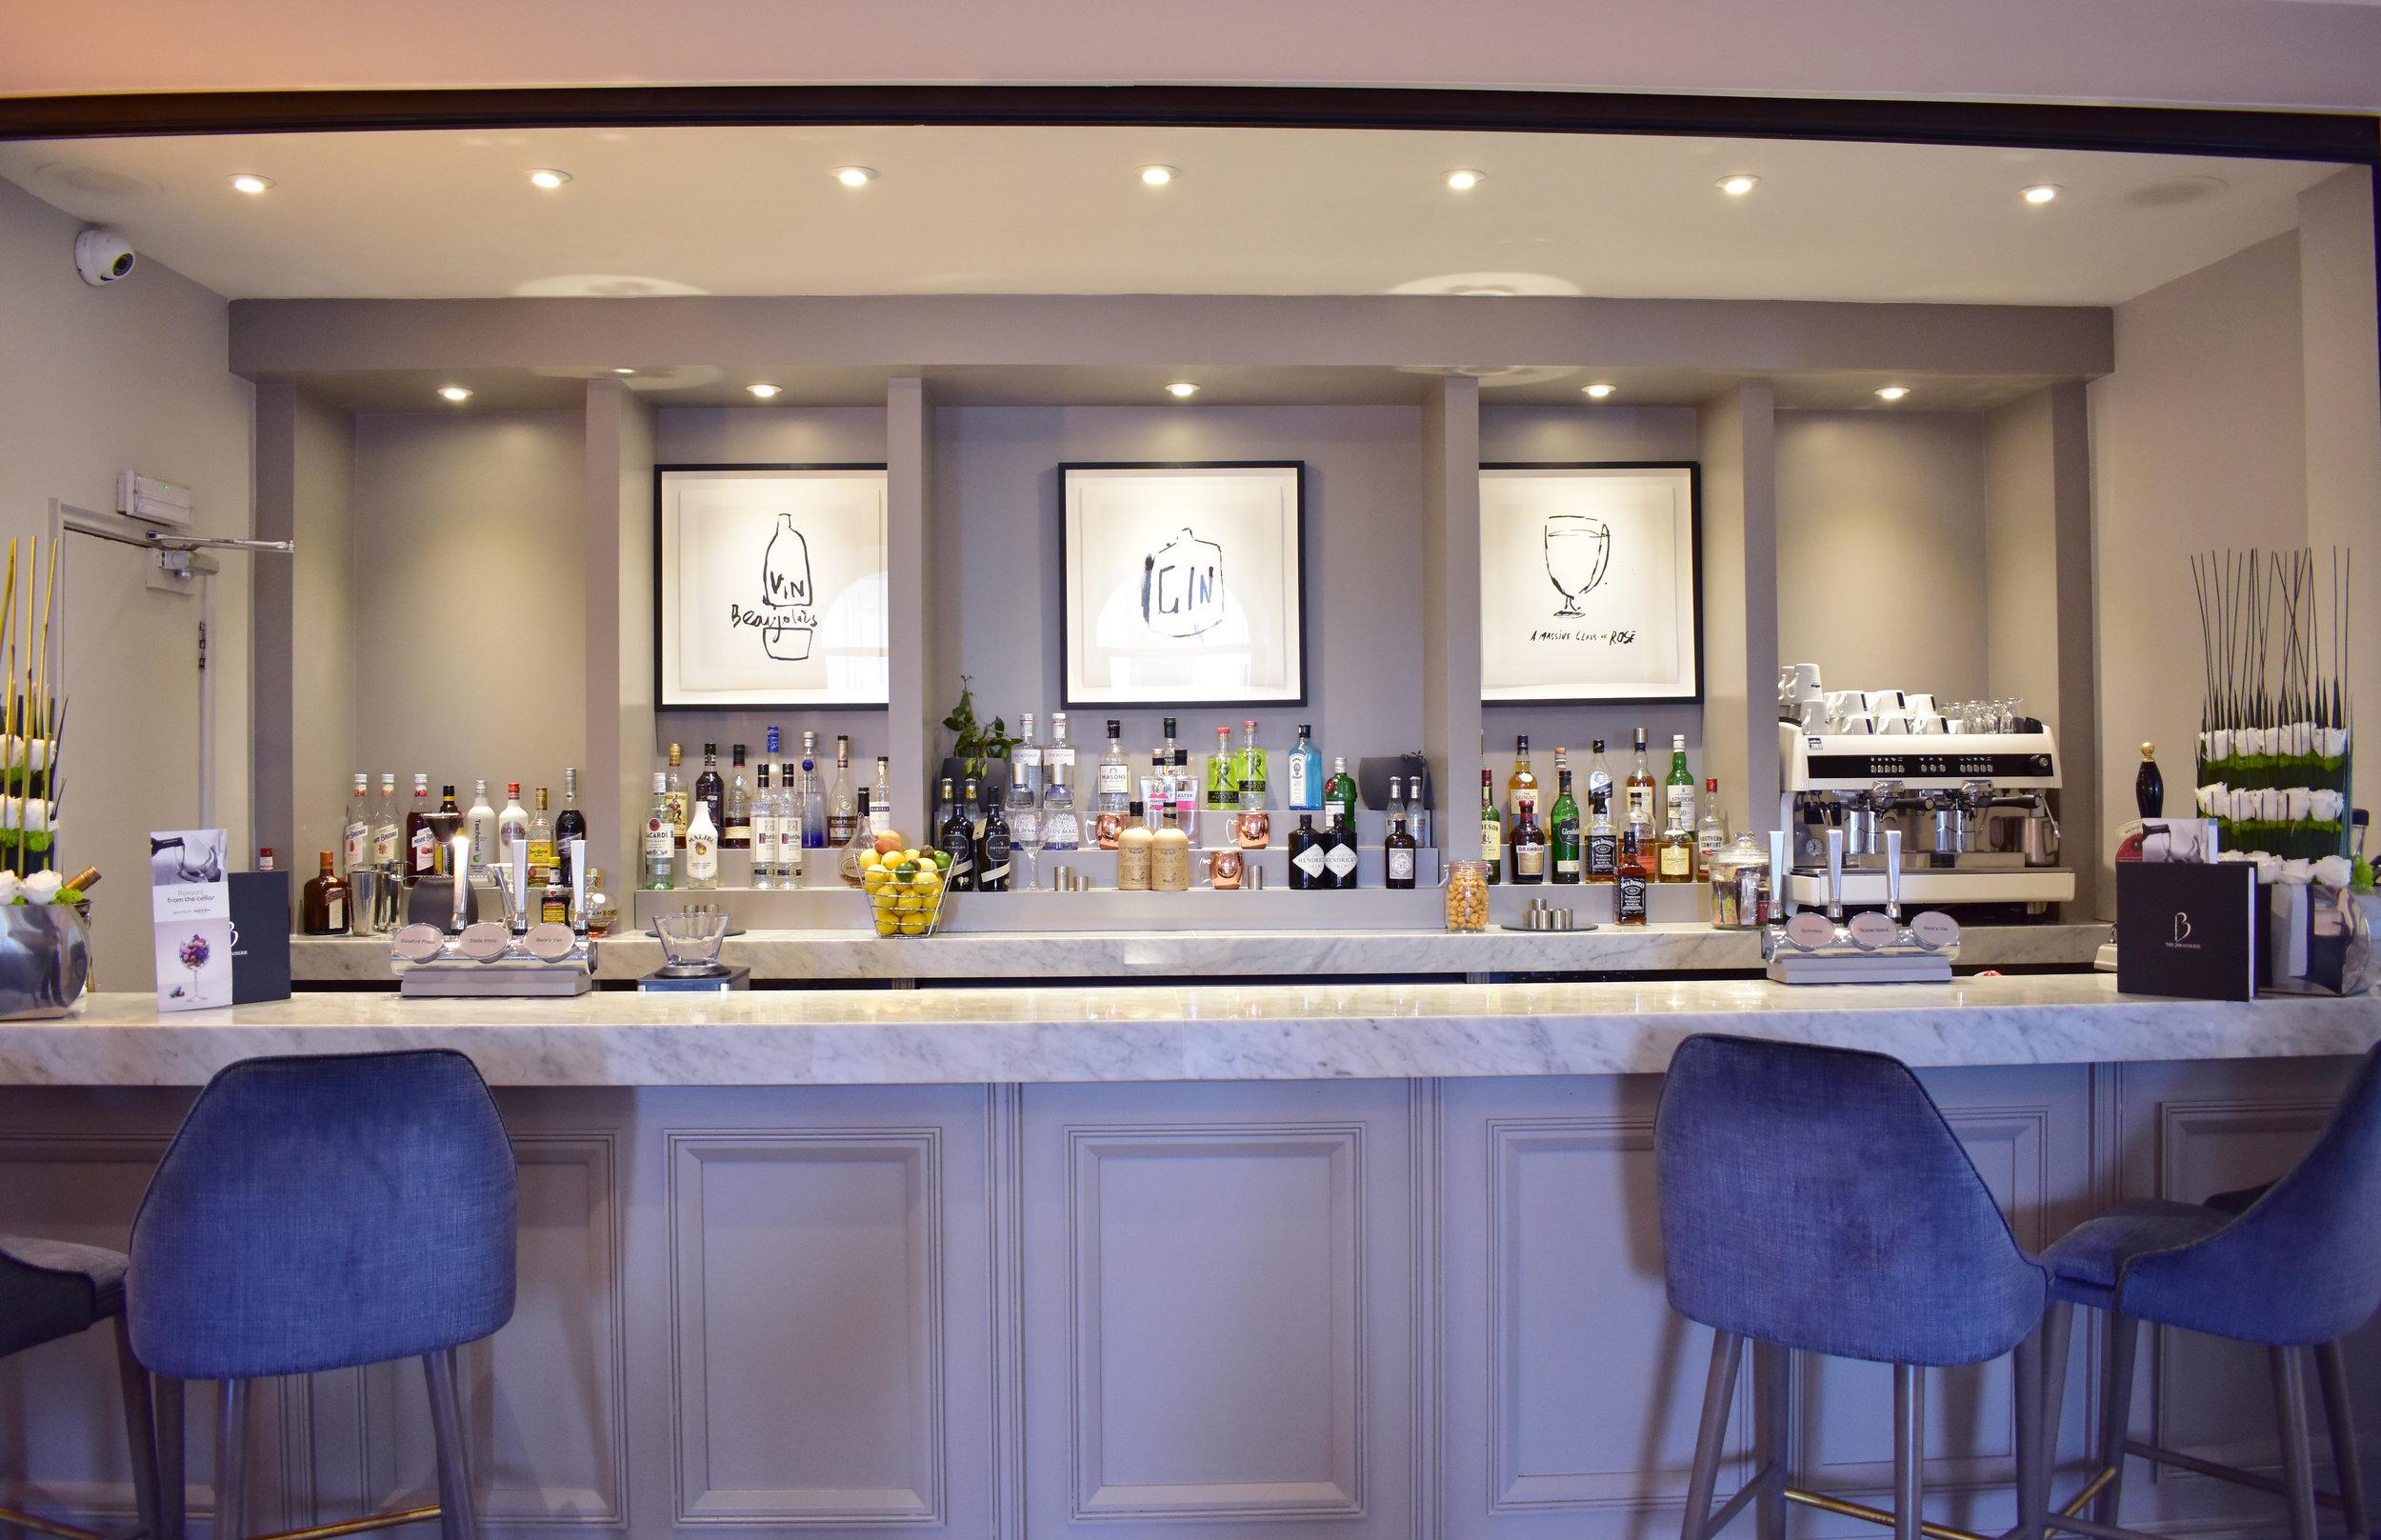 afternoon tea pink decor cotswolds pink grey blue bar.jpg